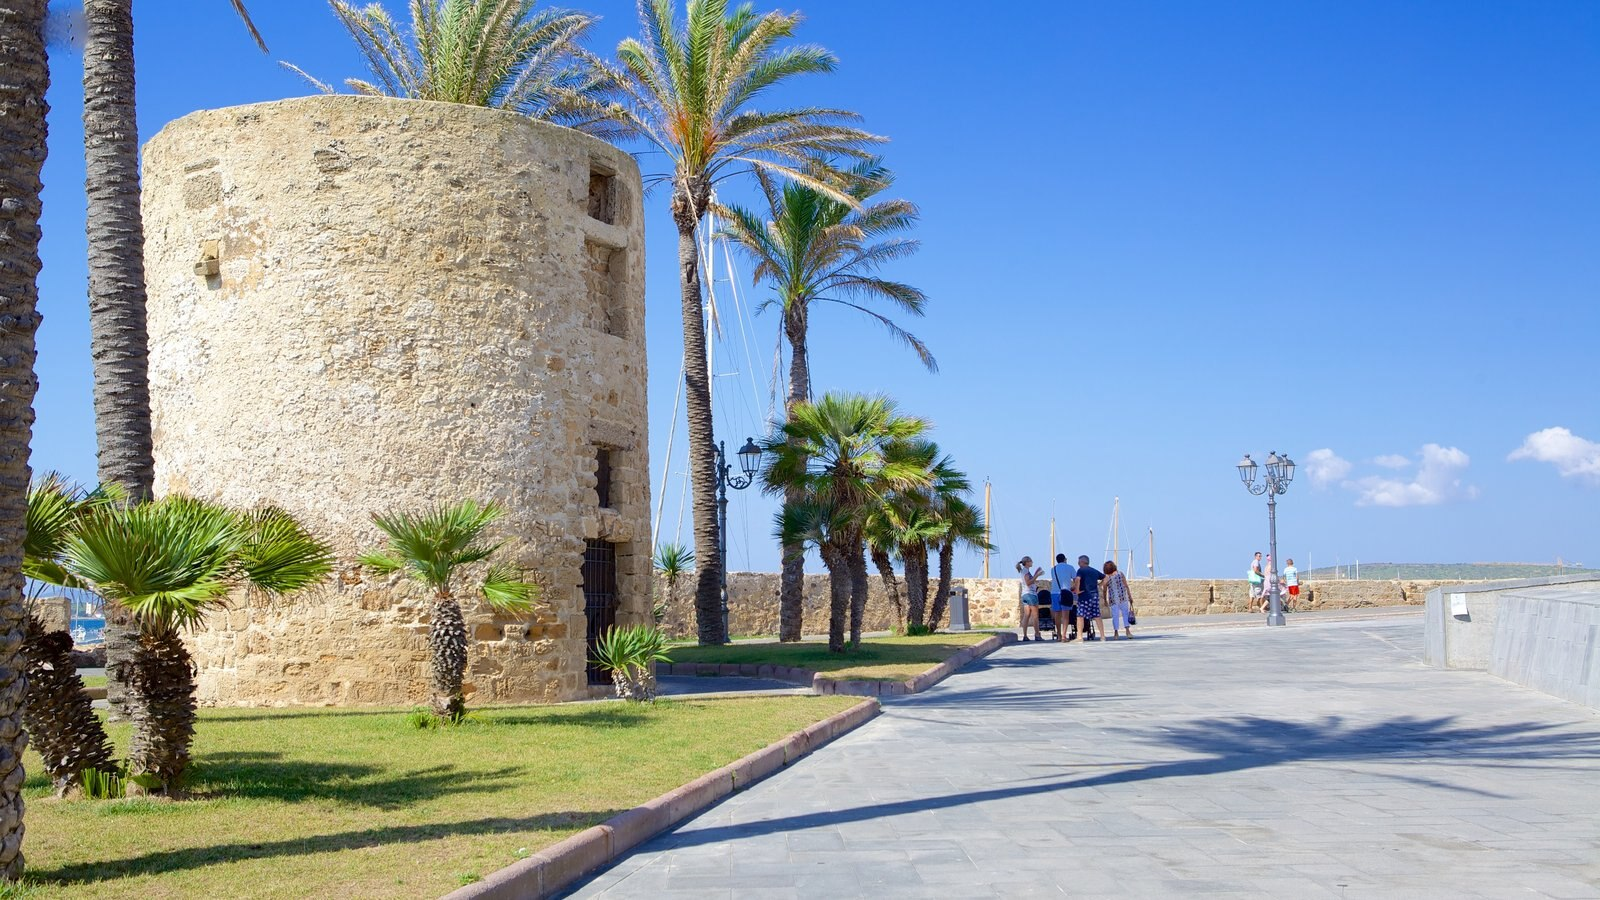 Alghero - Northern Sardinia which includes heritage architecture